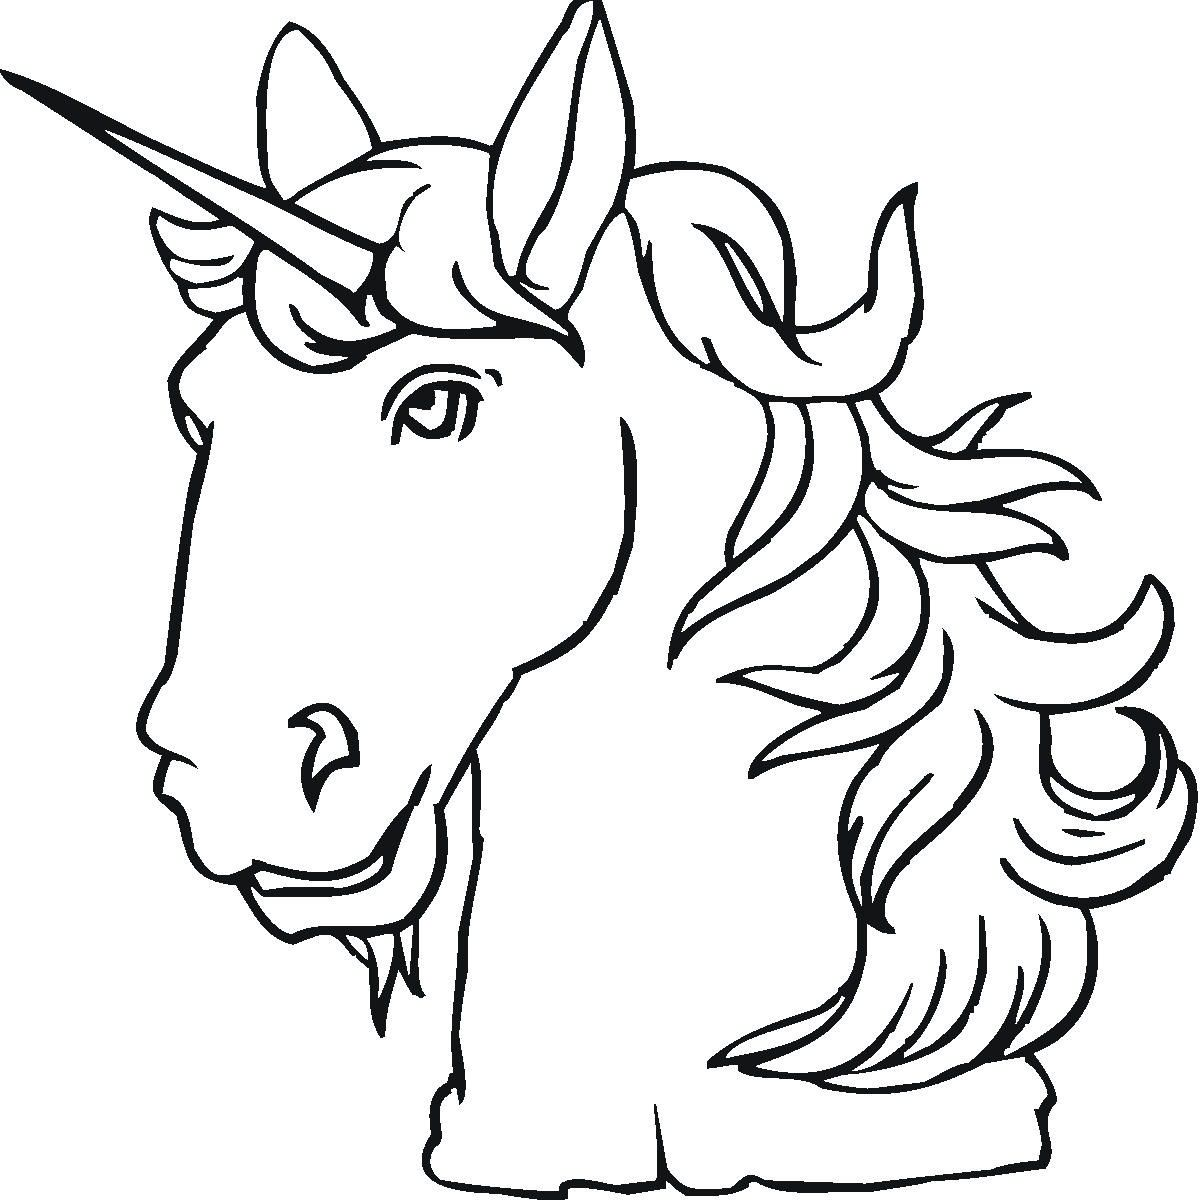 Unicorn Color Pages For Children Unicorn Coloring Pages Cartoon Coloring Pages Animal Coloring Pages